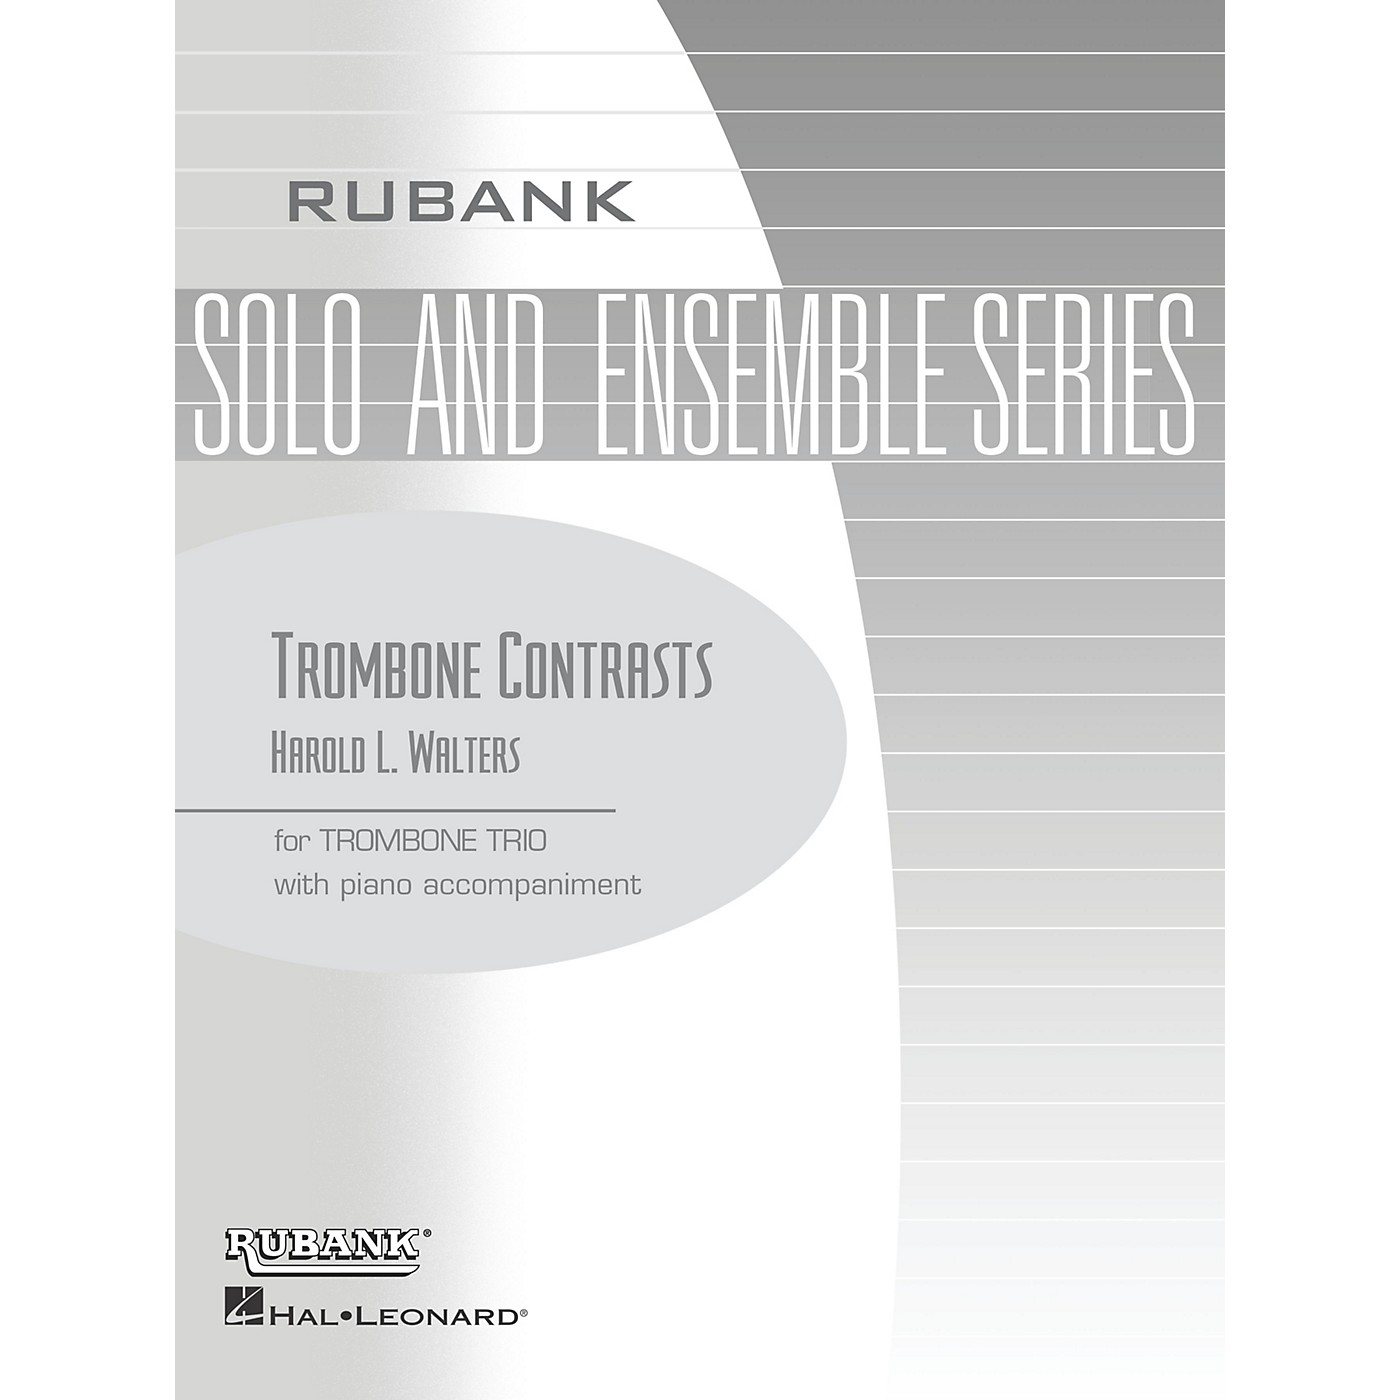 Rubank Publications Trombone Contrasts (Trombone Trio with Piano - Grade 2.5) Rubank Solo/Ensemble Sheet Series thumbnail